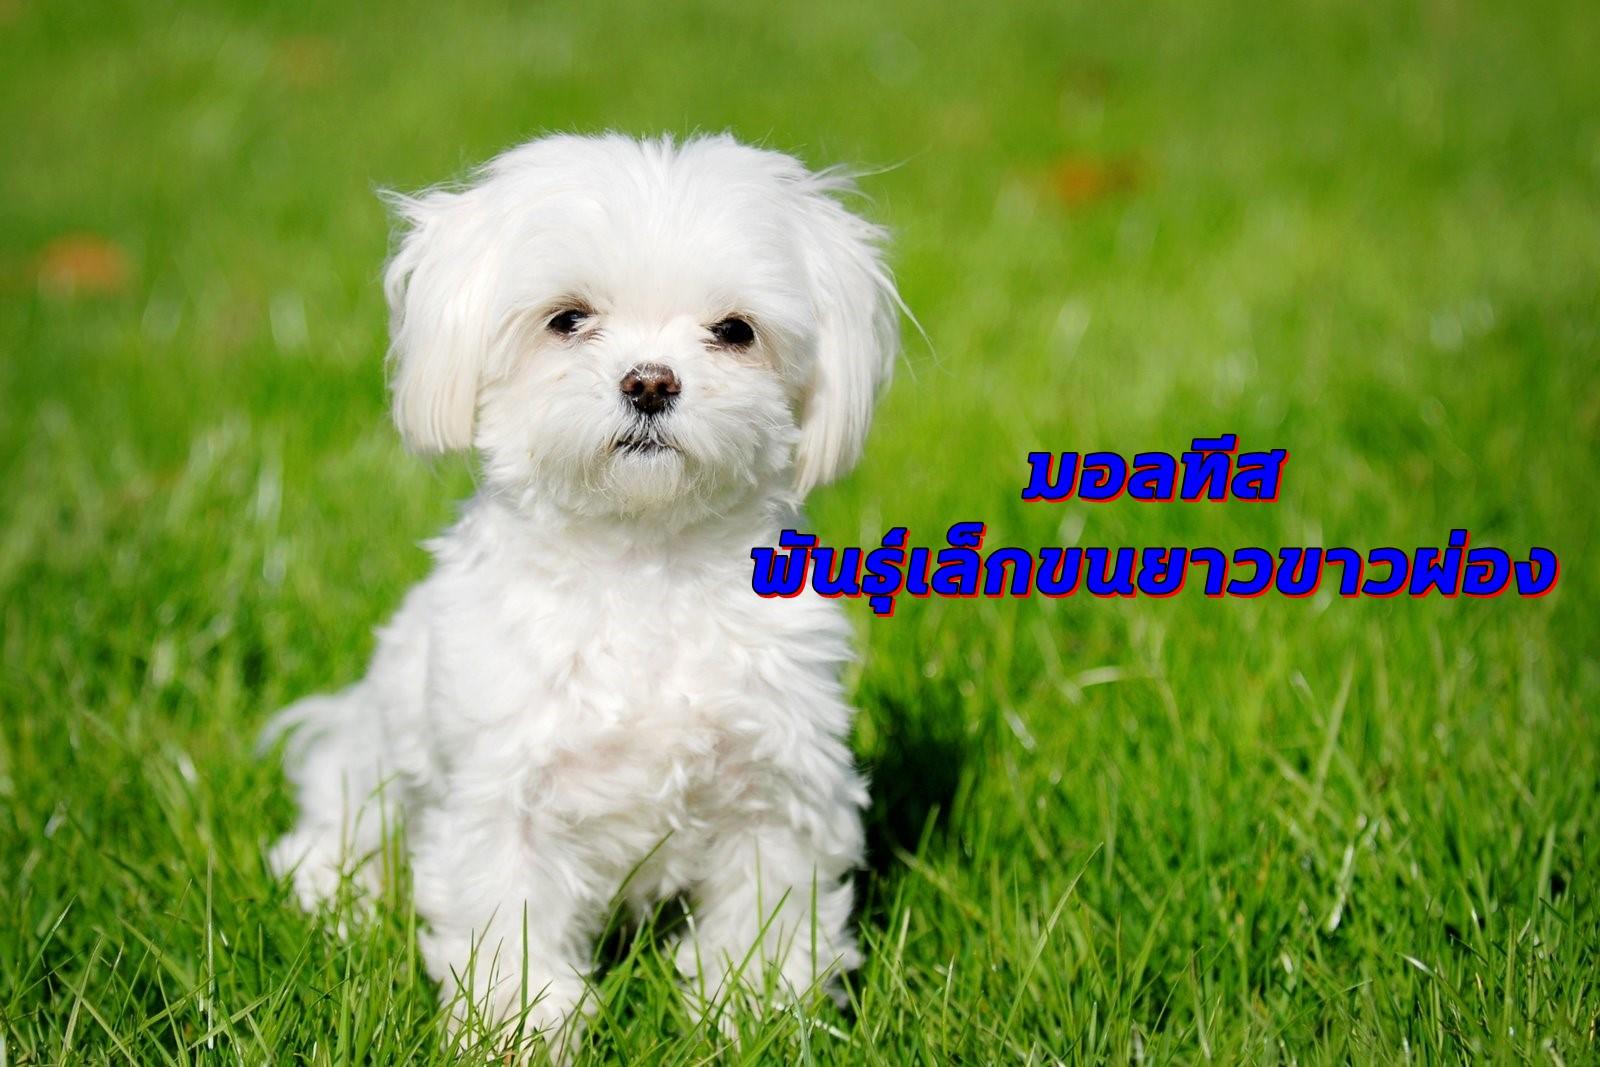 Maltese หมาพันธุ์เล็กขนยาวขาวผ่อง เป็นสุนัขที่สังคมให้คุณค่าสูงมาก